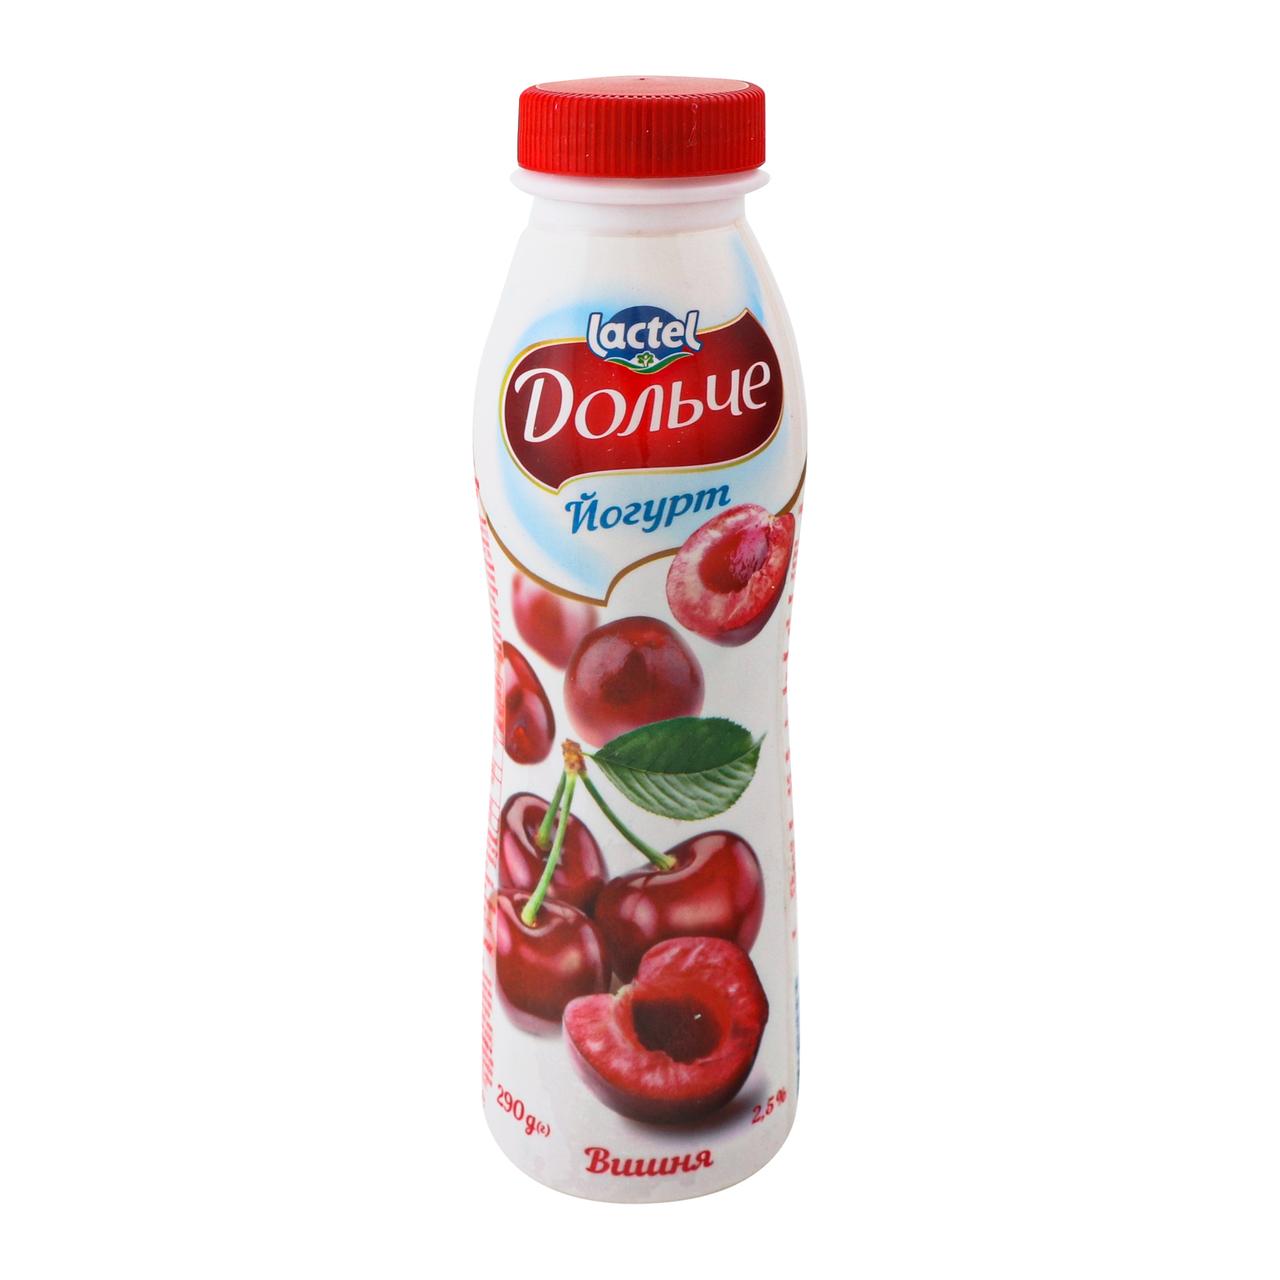 Йогурт Дольче Вишня 2.5% 290г